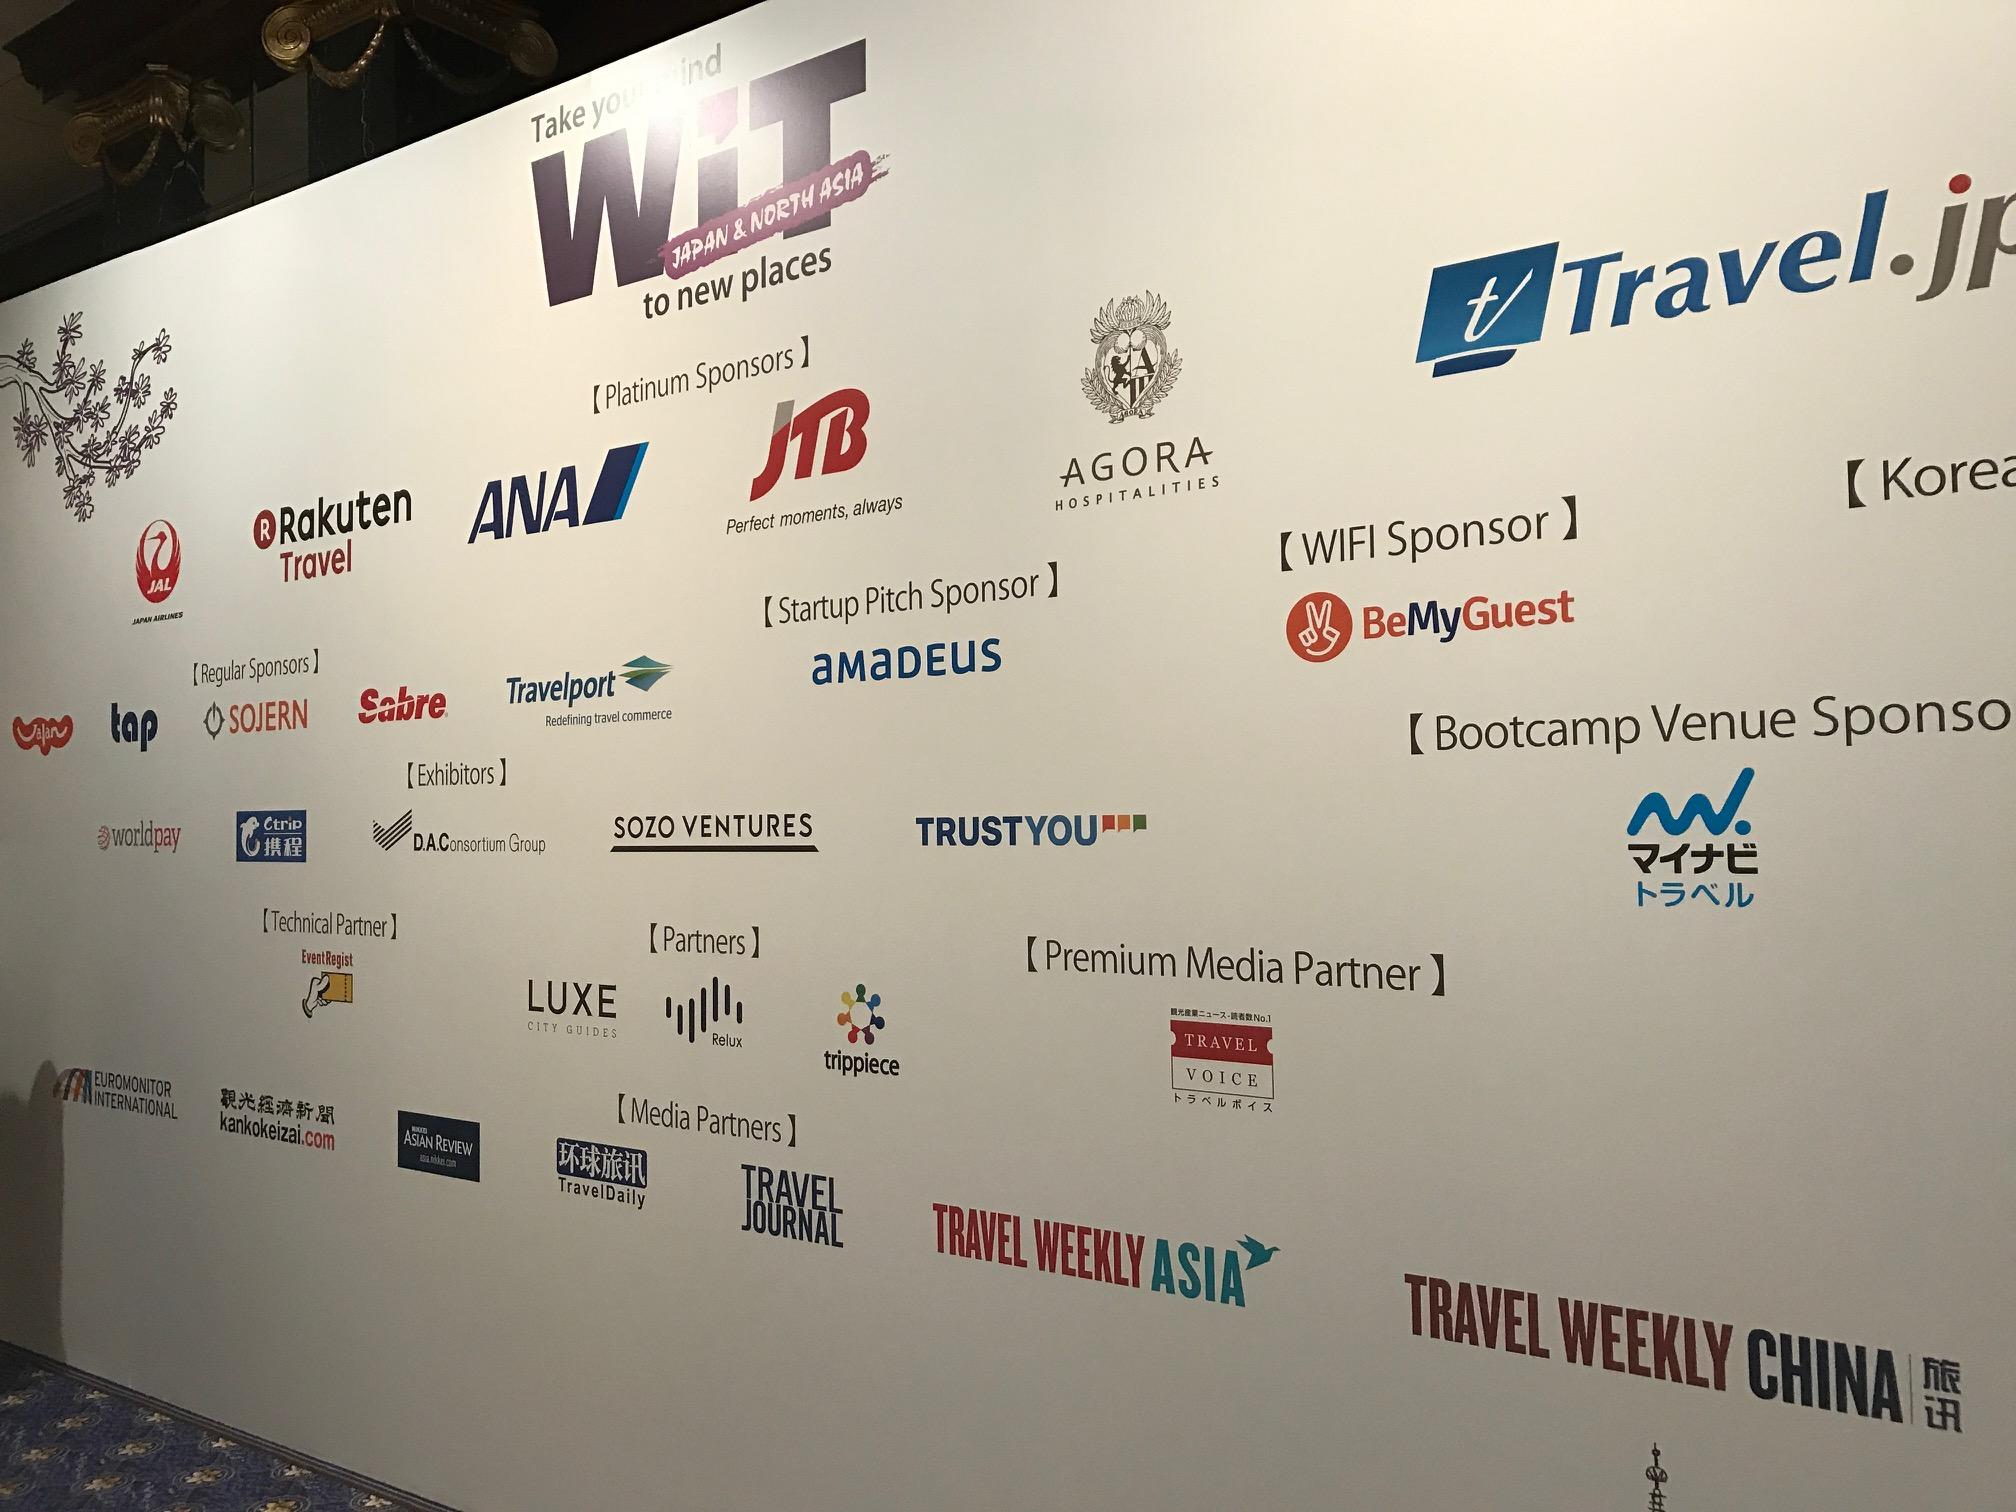 JALとANAが航空流通とマーケティングを議論、航空券予約の近未来と注目の市場トレンドとは? ―WIT Japan 2017